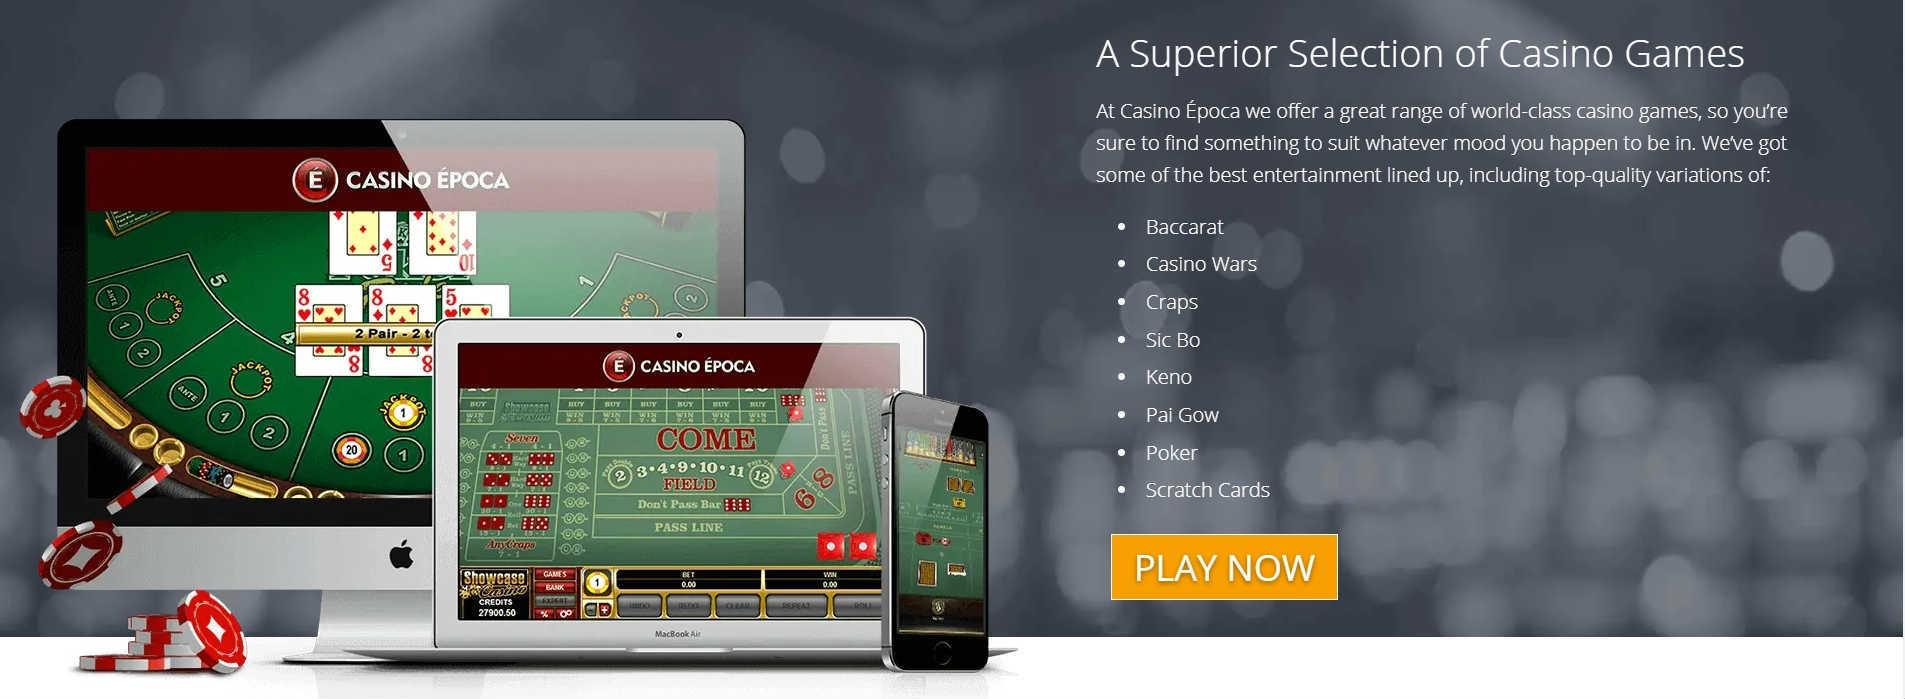 Casino Epcoa Online Casino Games